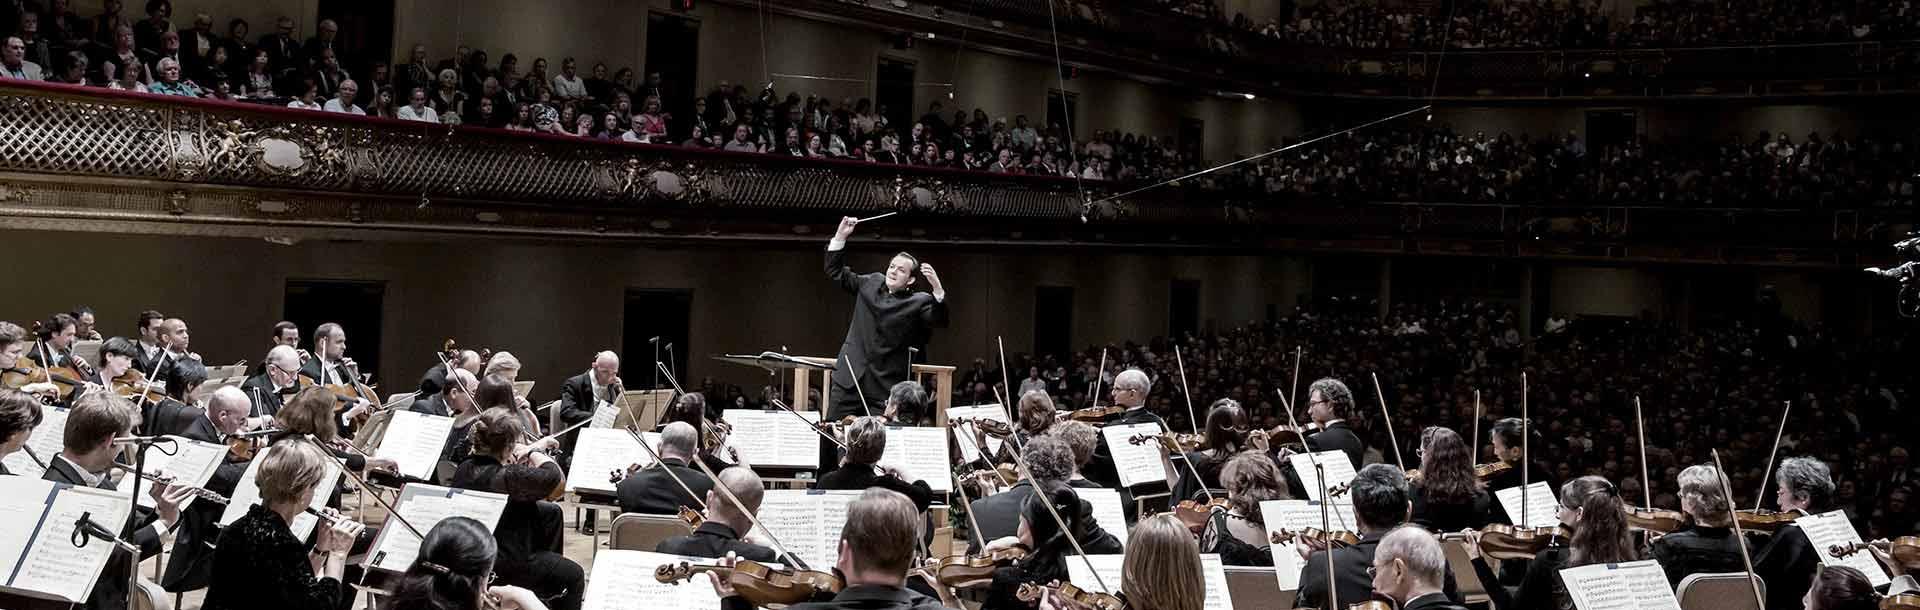 boston_symphony_orchestra_andris_nelsons_emanuel_ax_orchestre_symphonique_de_montreal_1920_610